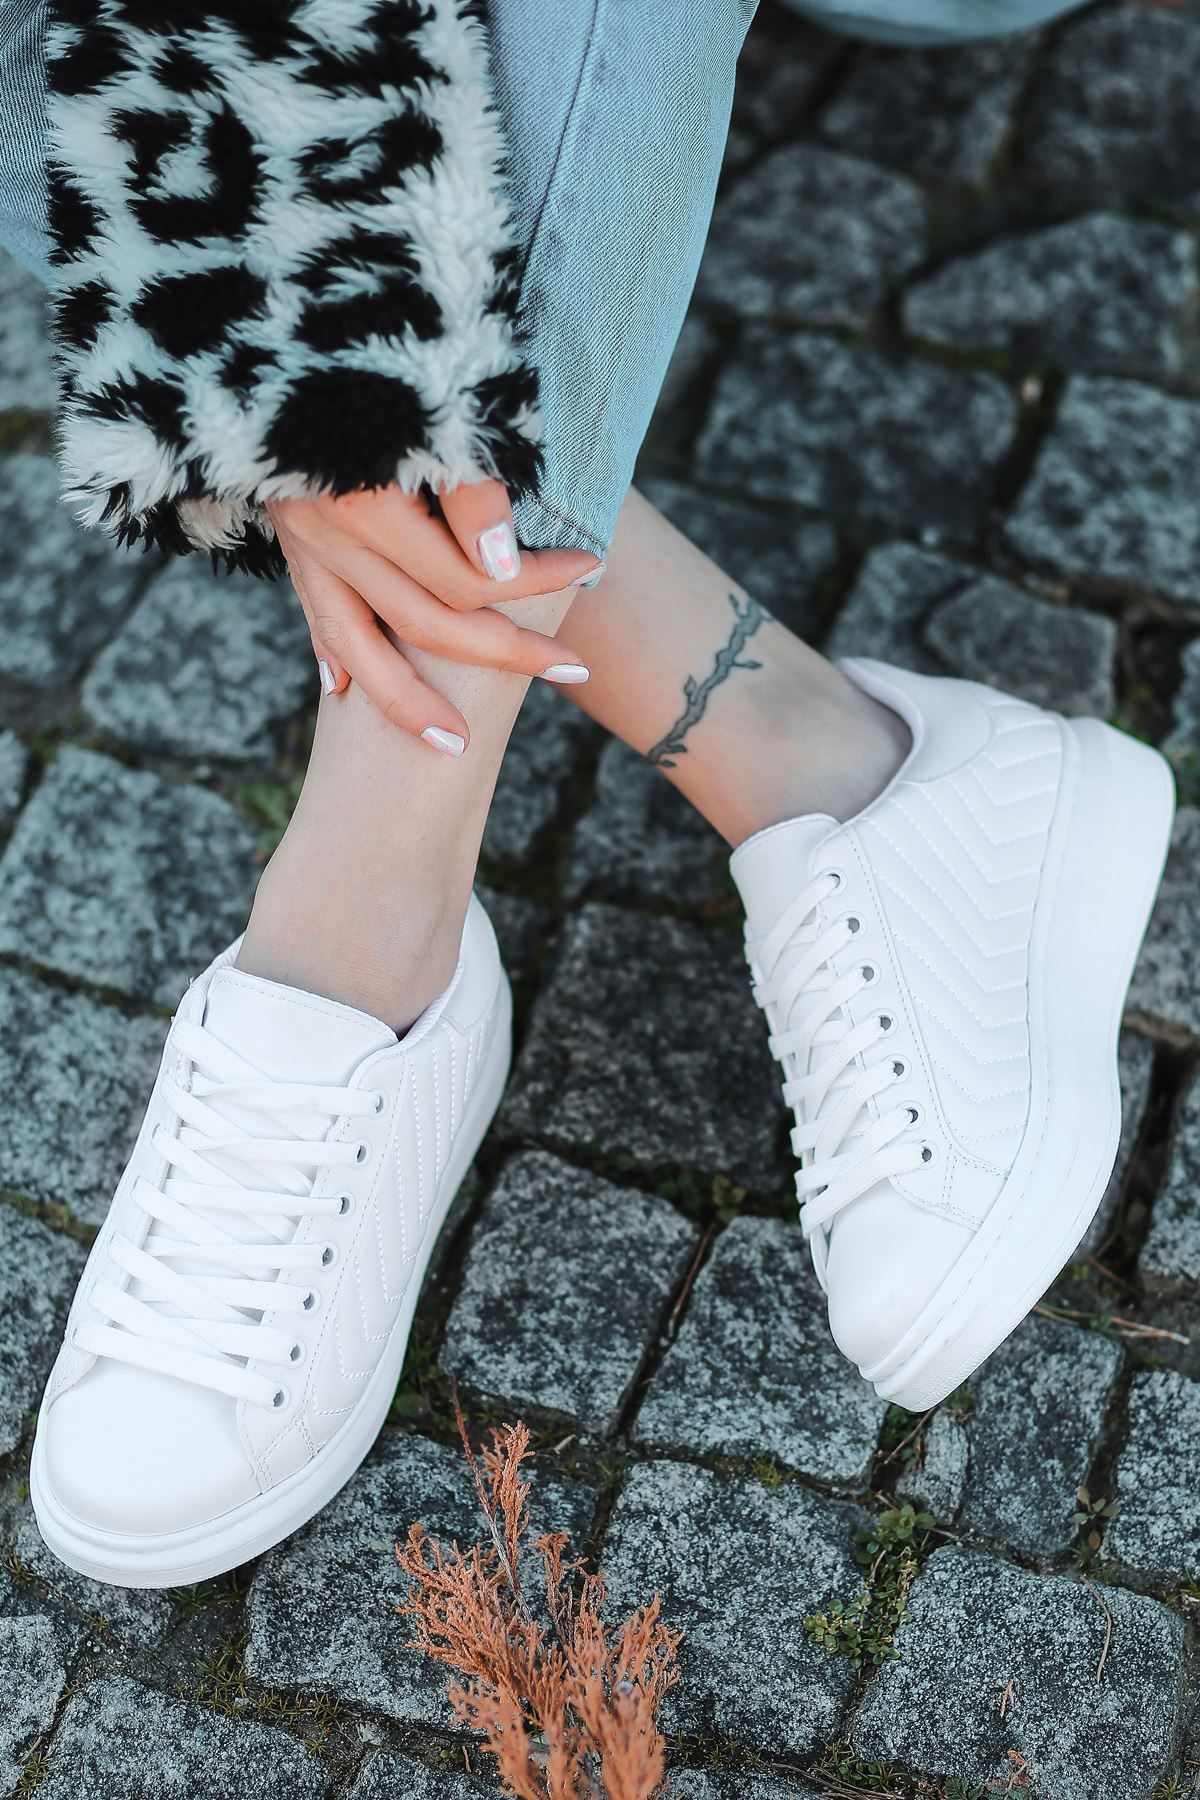 Lucy Mat Deri Dikiş Detaylı İnce Taban Sneakers Beyaz